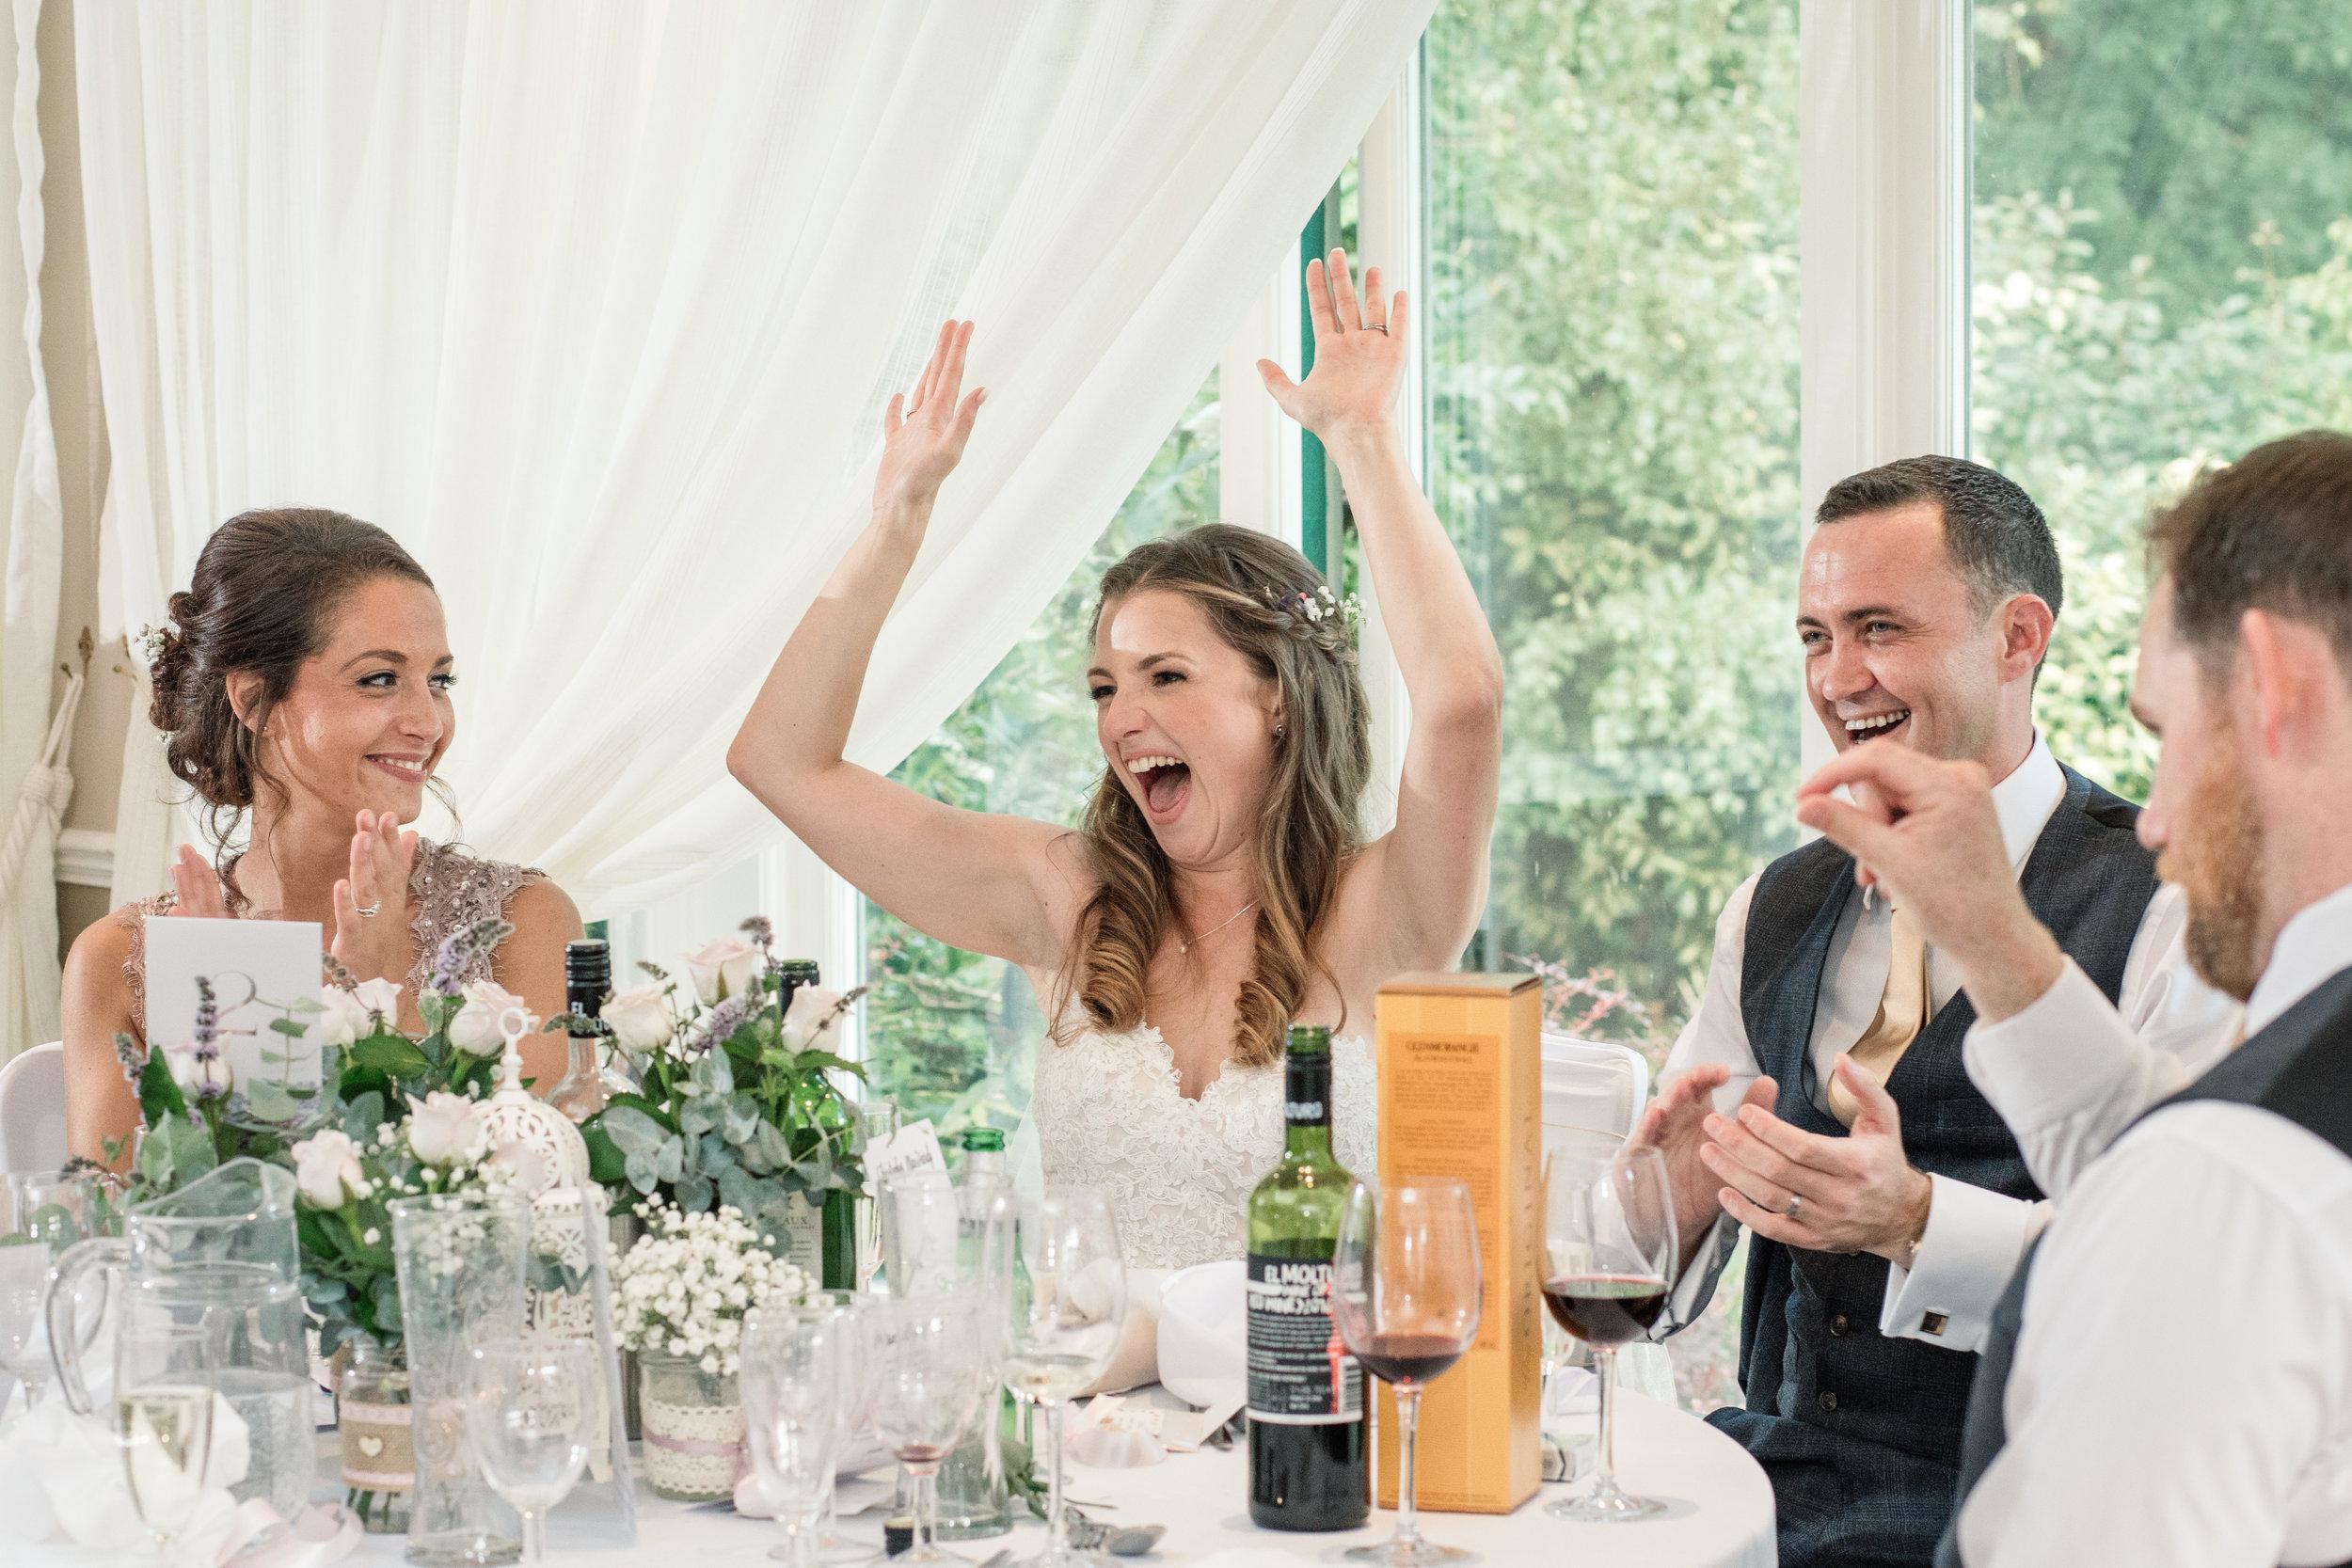 becky-harley-photography-hertfordshire-wedding-photographer-026.JPG